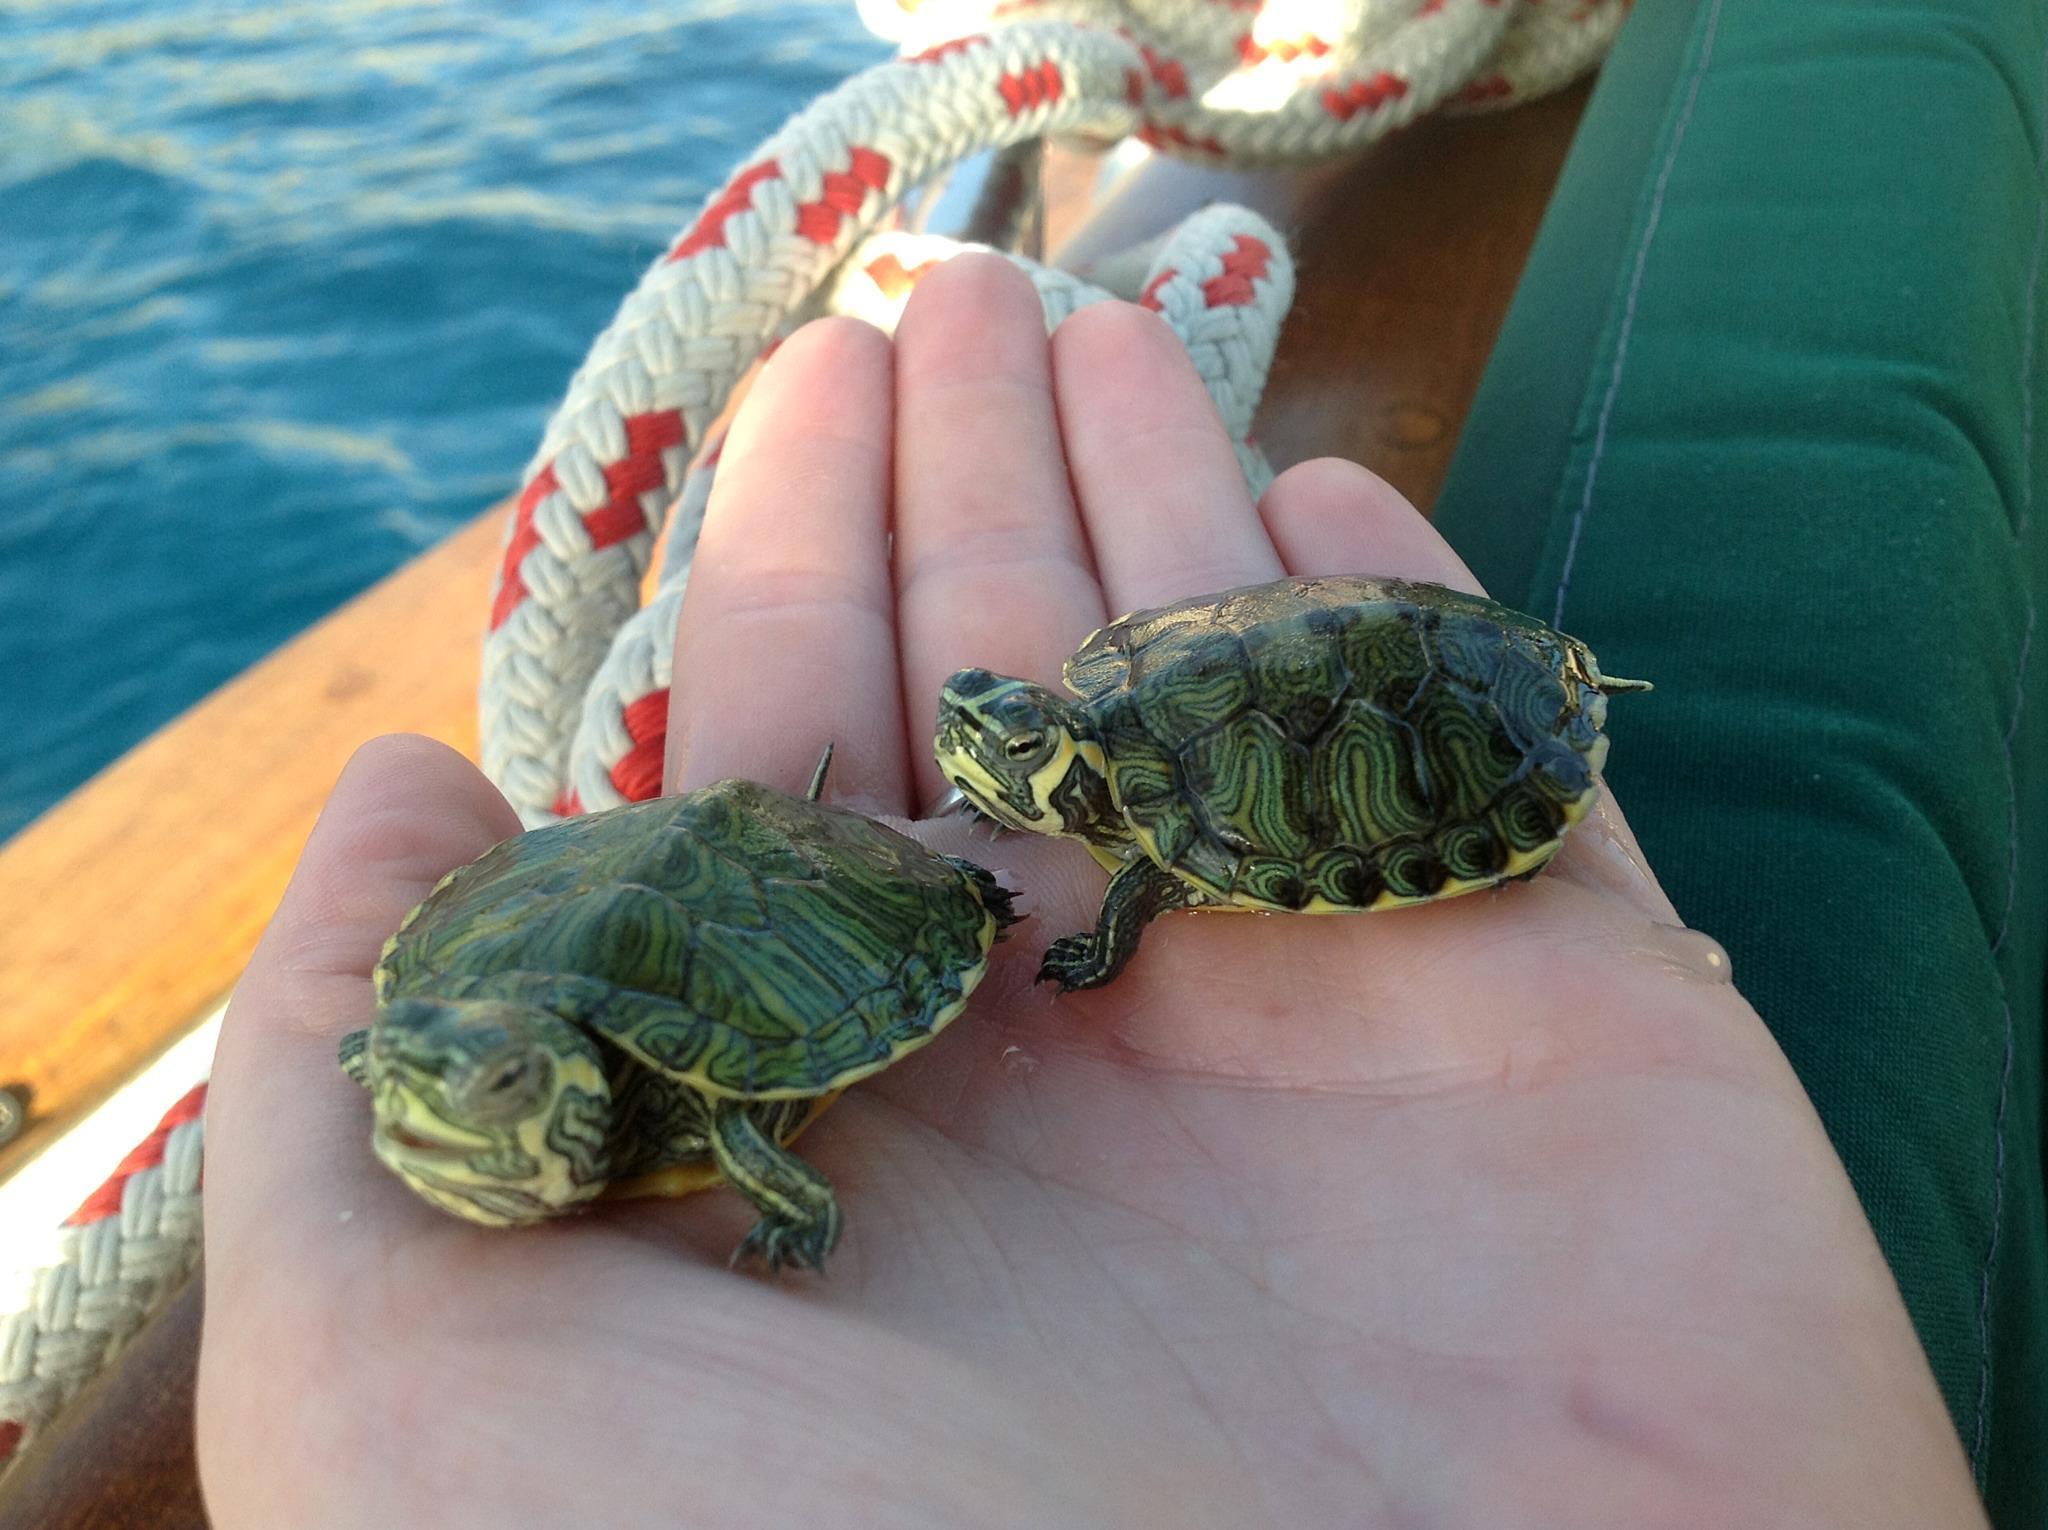 Best Turtle Pet : My pet ninja turtles! - Bailey Boat Cat